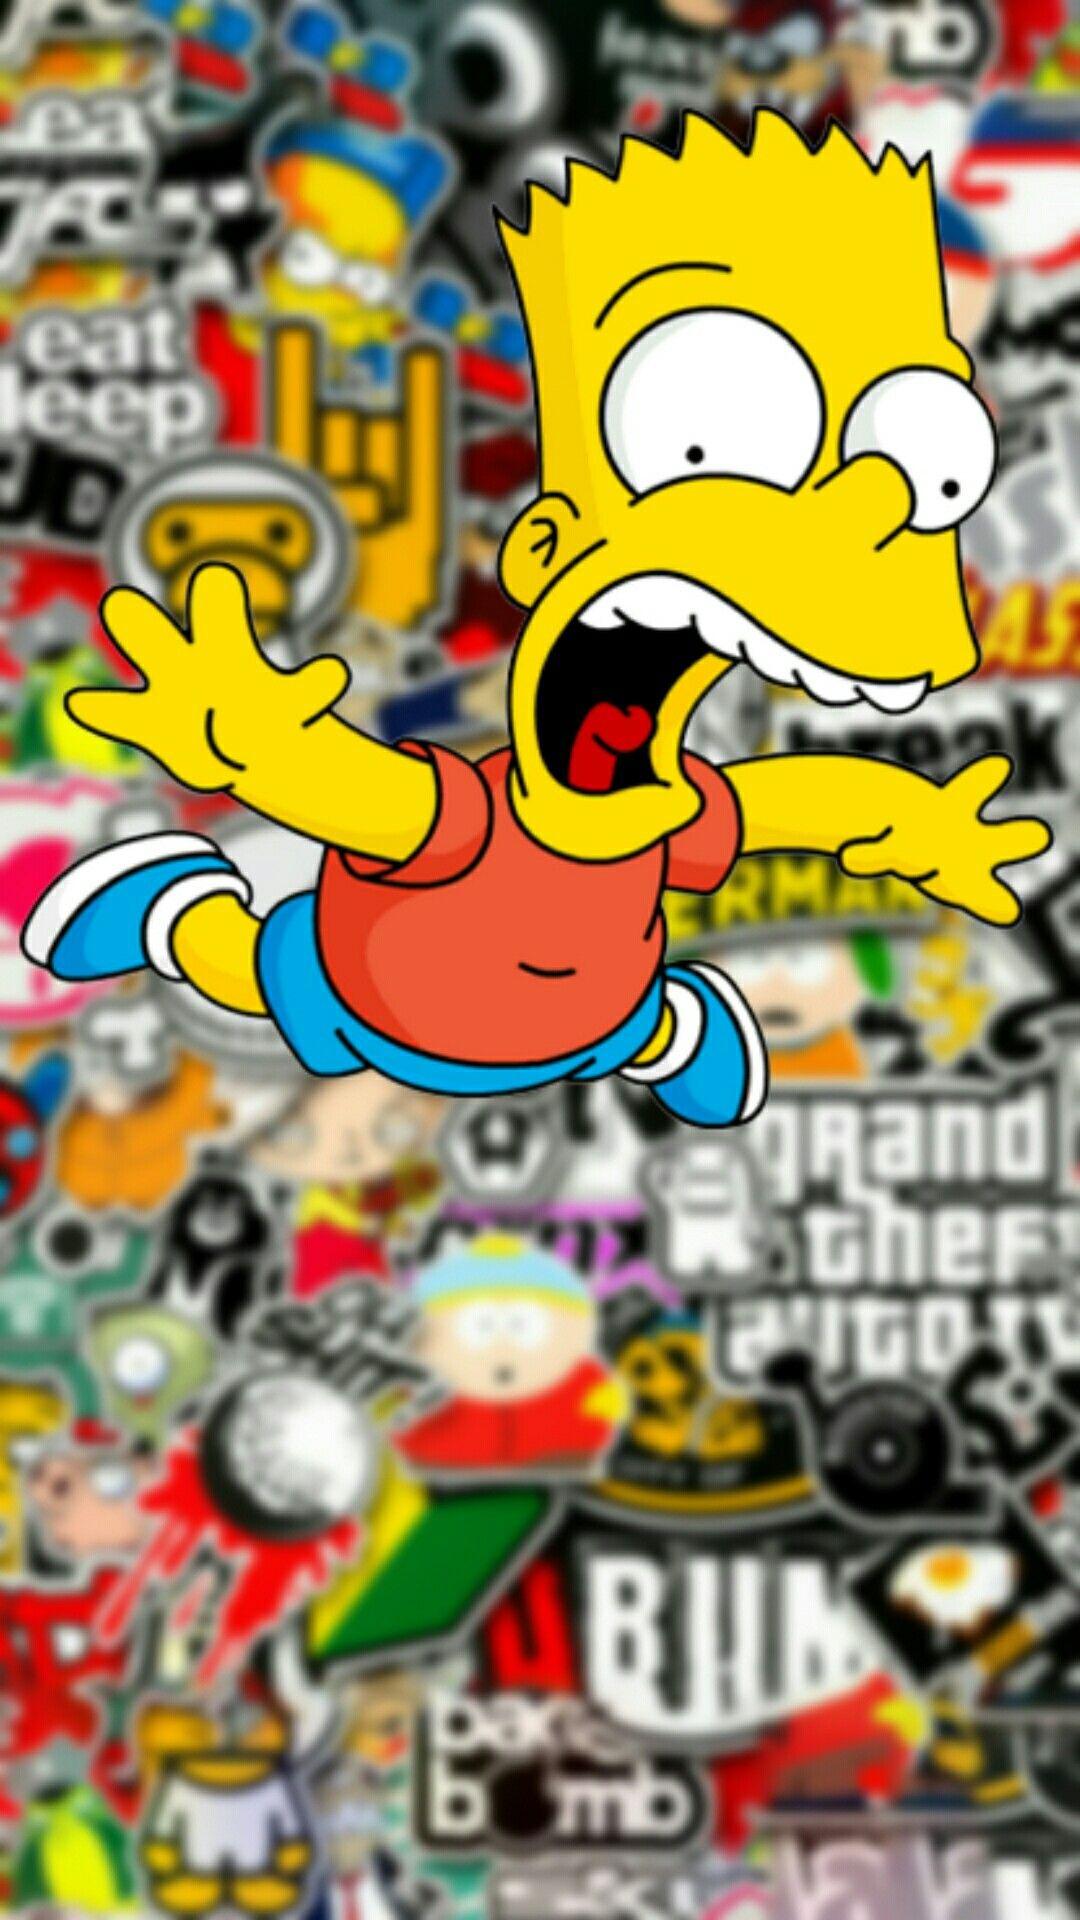 Bart Simpson Trippy Wallpaper : simpson, trippy, wallpaper, Simpson, Wallpaper, Iphone,, Cartoon, Wallpaper,, Iphone